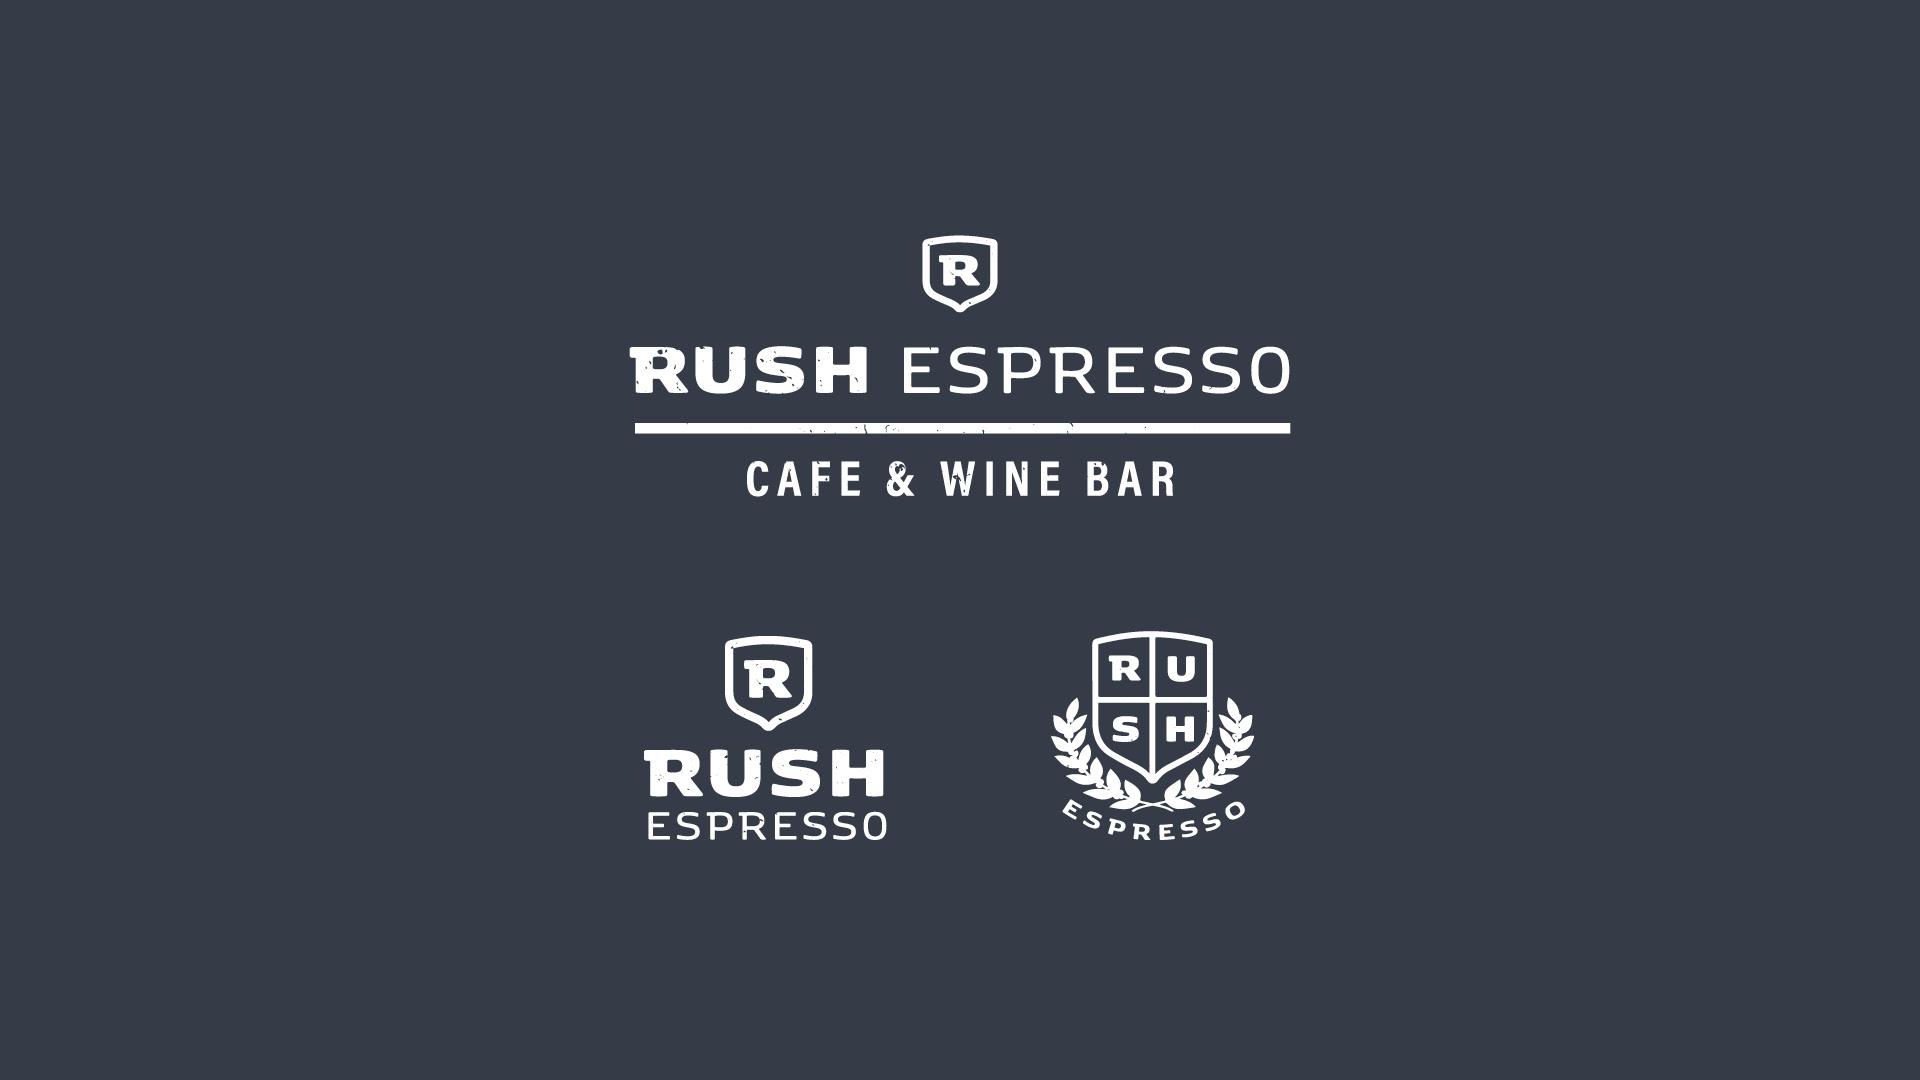 Rush Espresso2.jpg